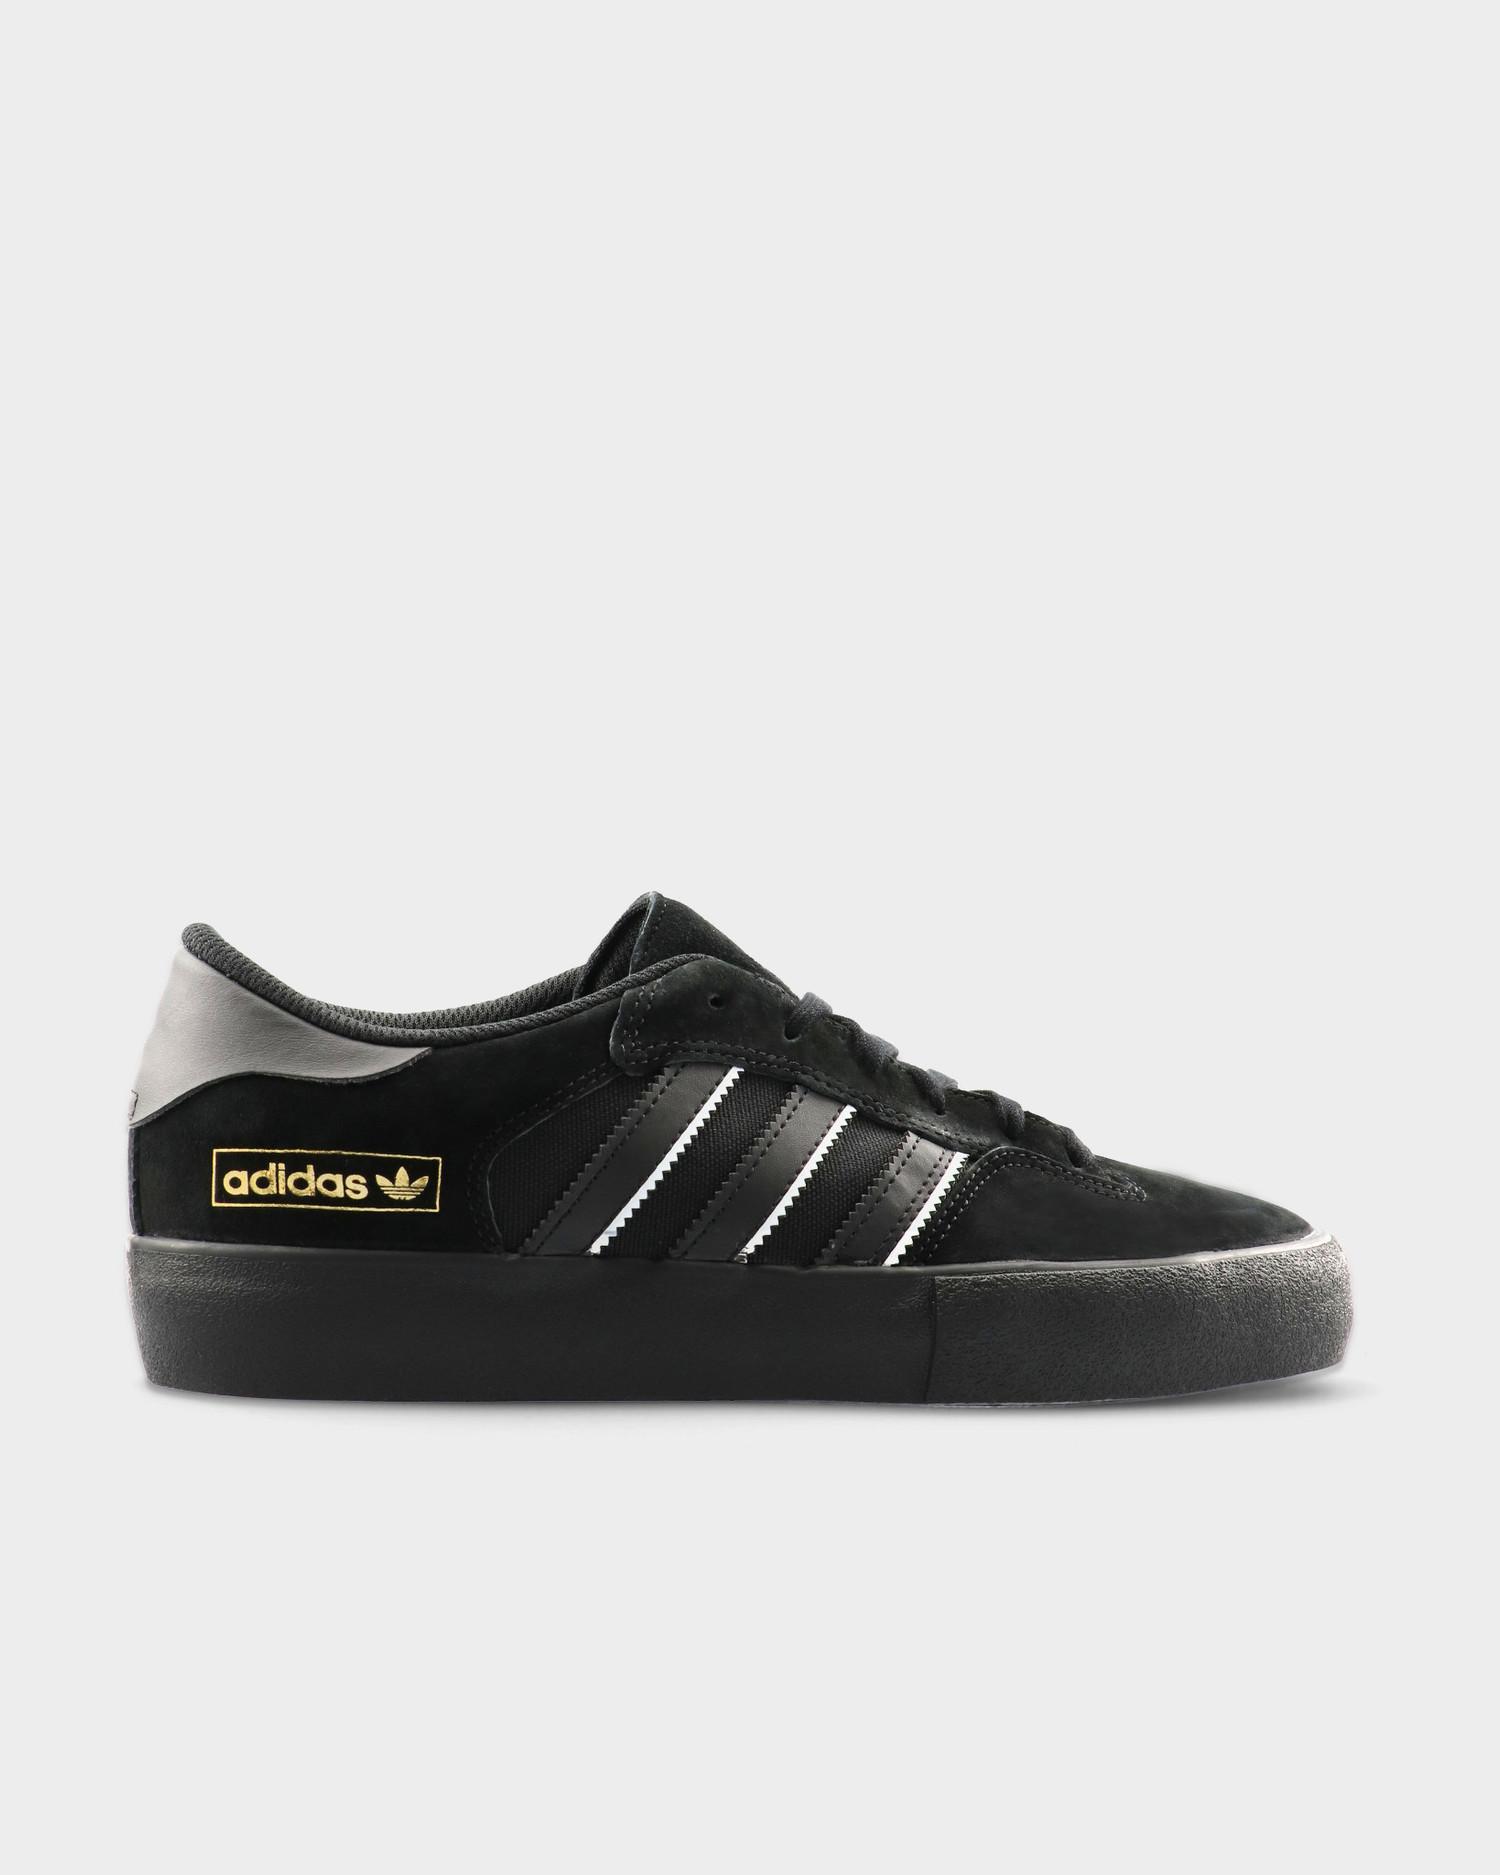 Adidas Matchbreak Super Cblack/Ftwwht/Gum